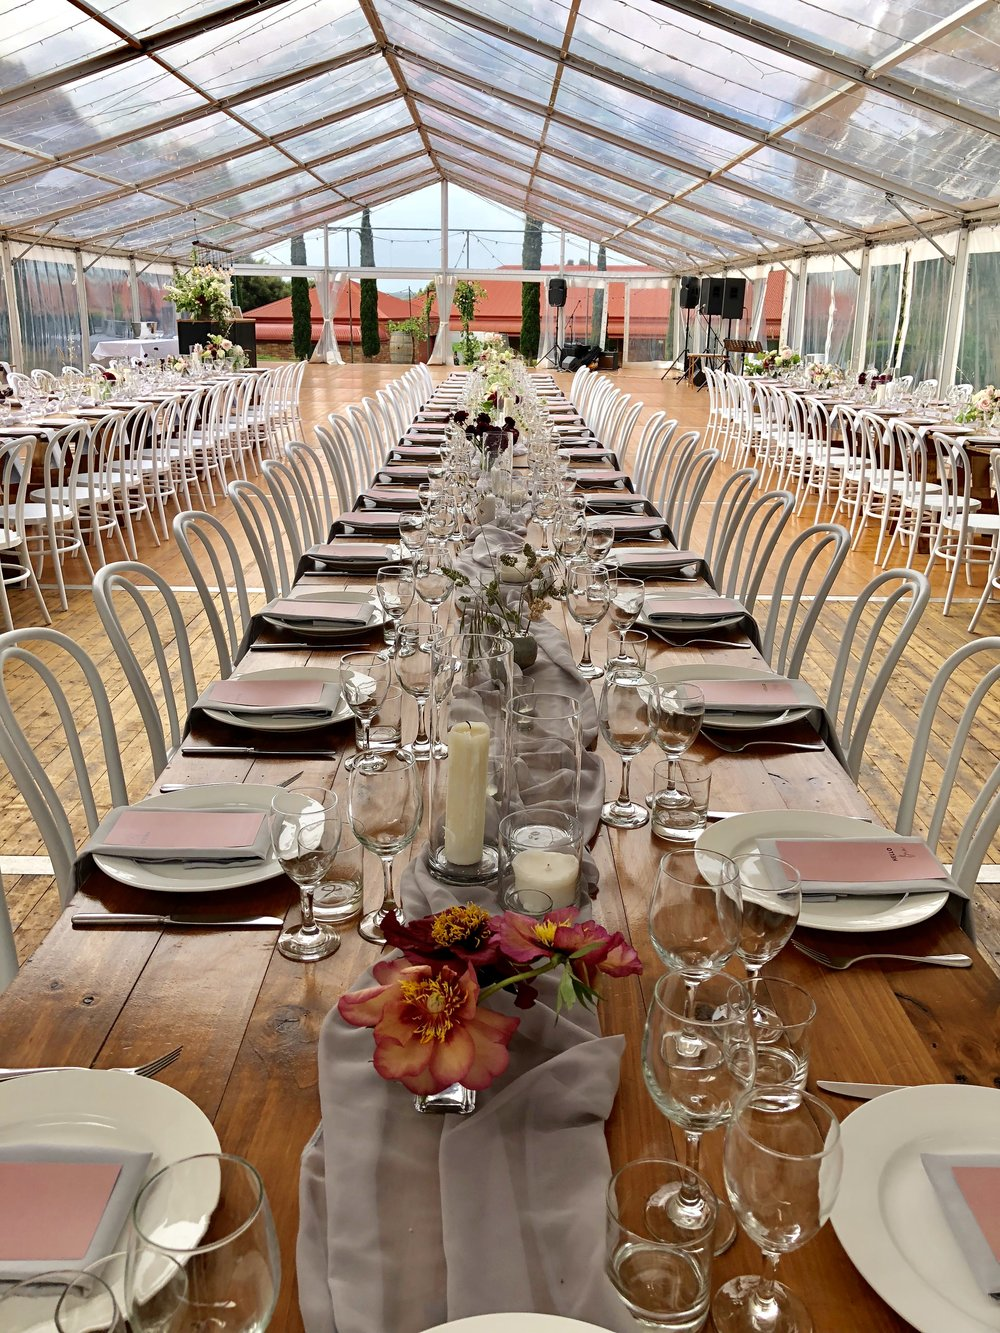 Grand Events Warrnambool Party Hire Event Styling Warrnambool Weddings 11.jpg